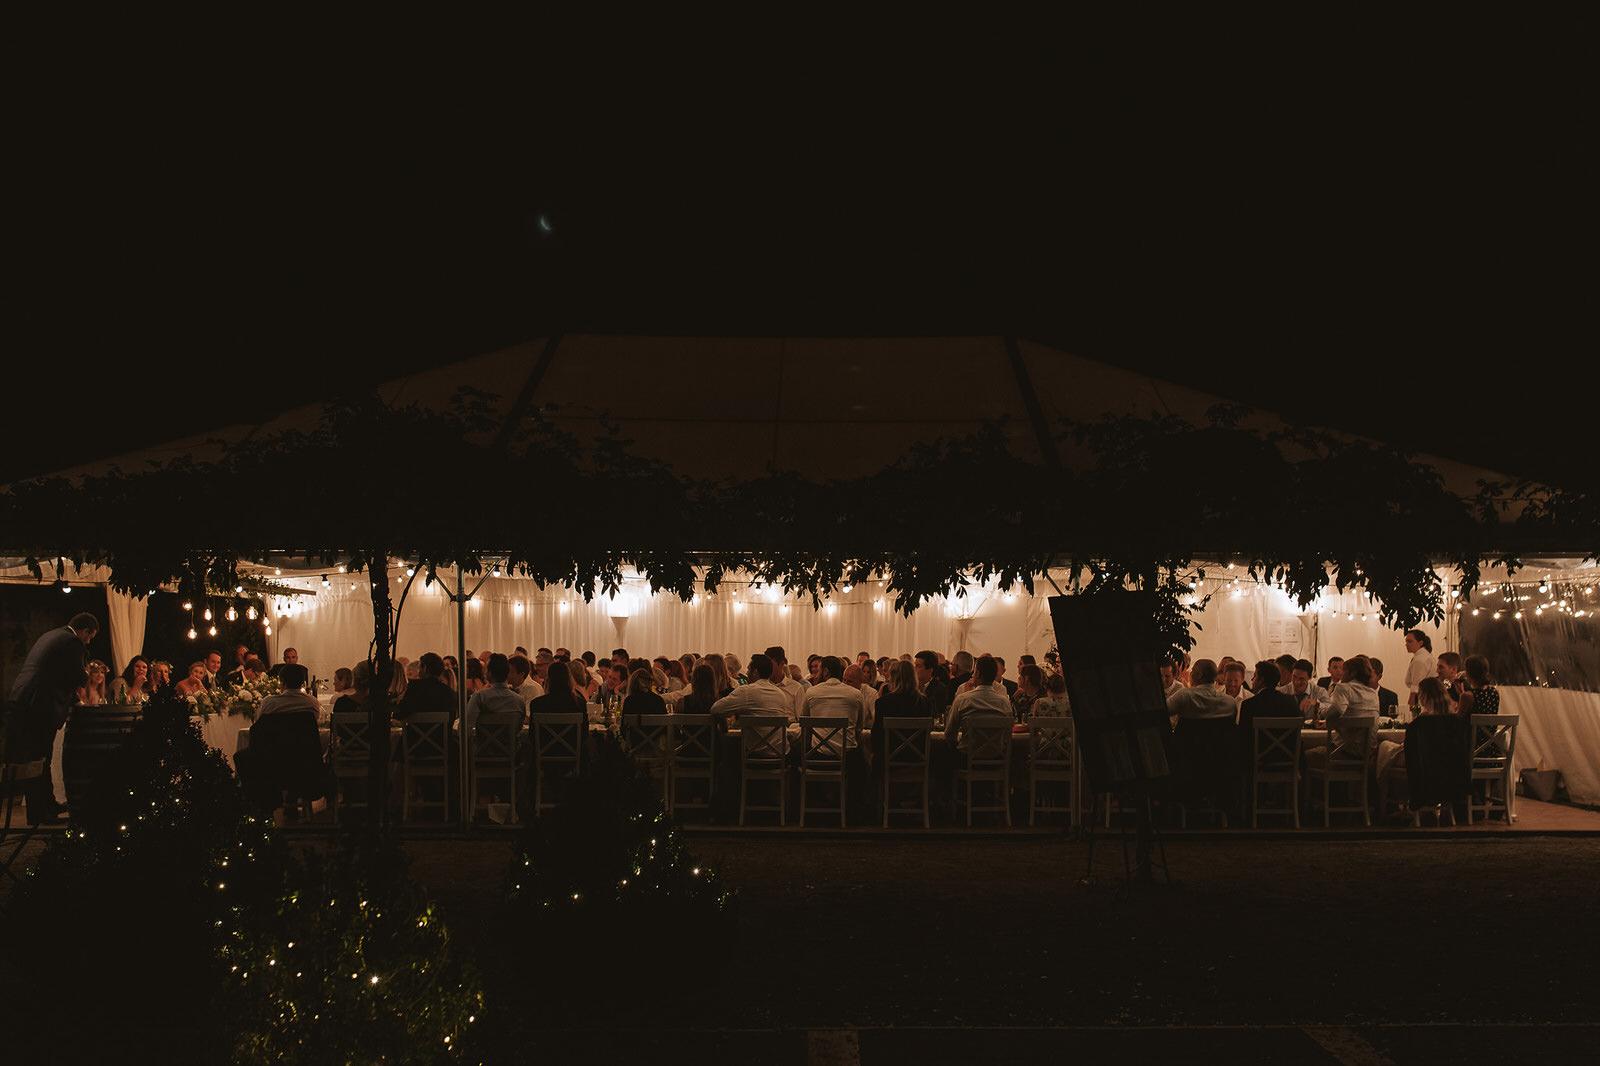 newfound-r-s-ataahua-garden-venue-tauranga-wedding-135